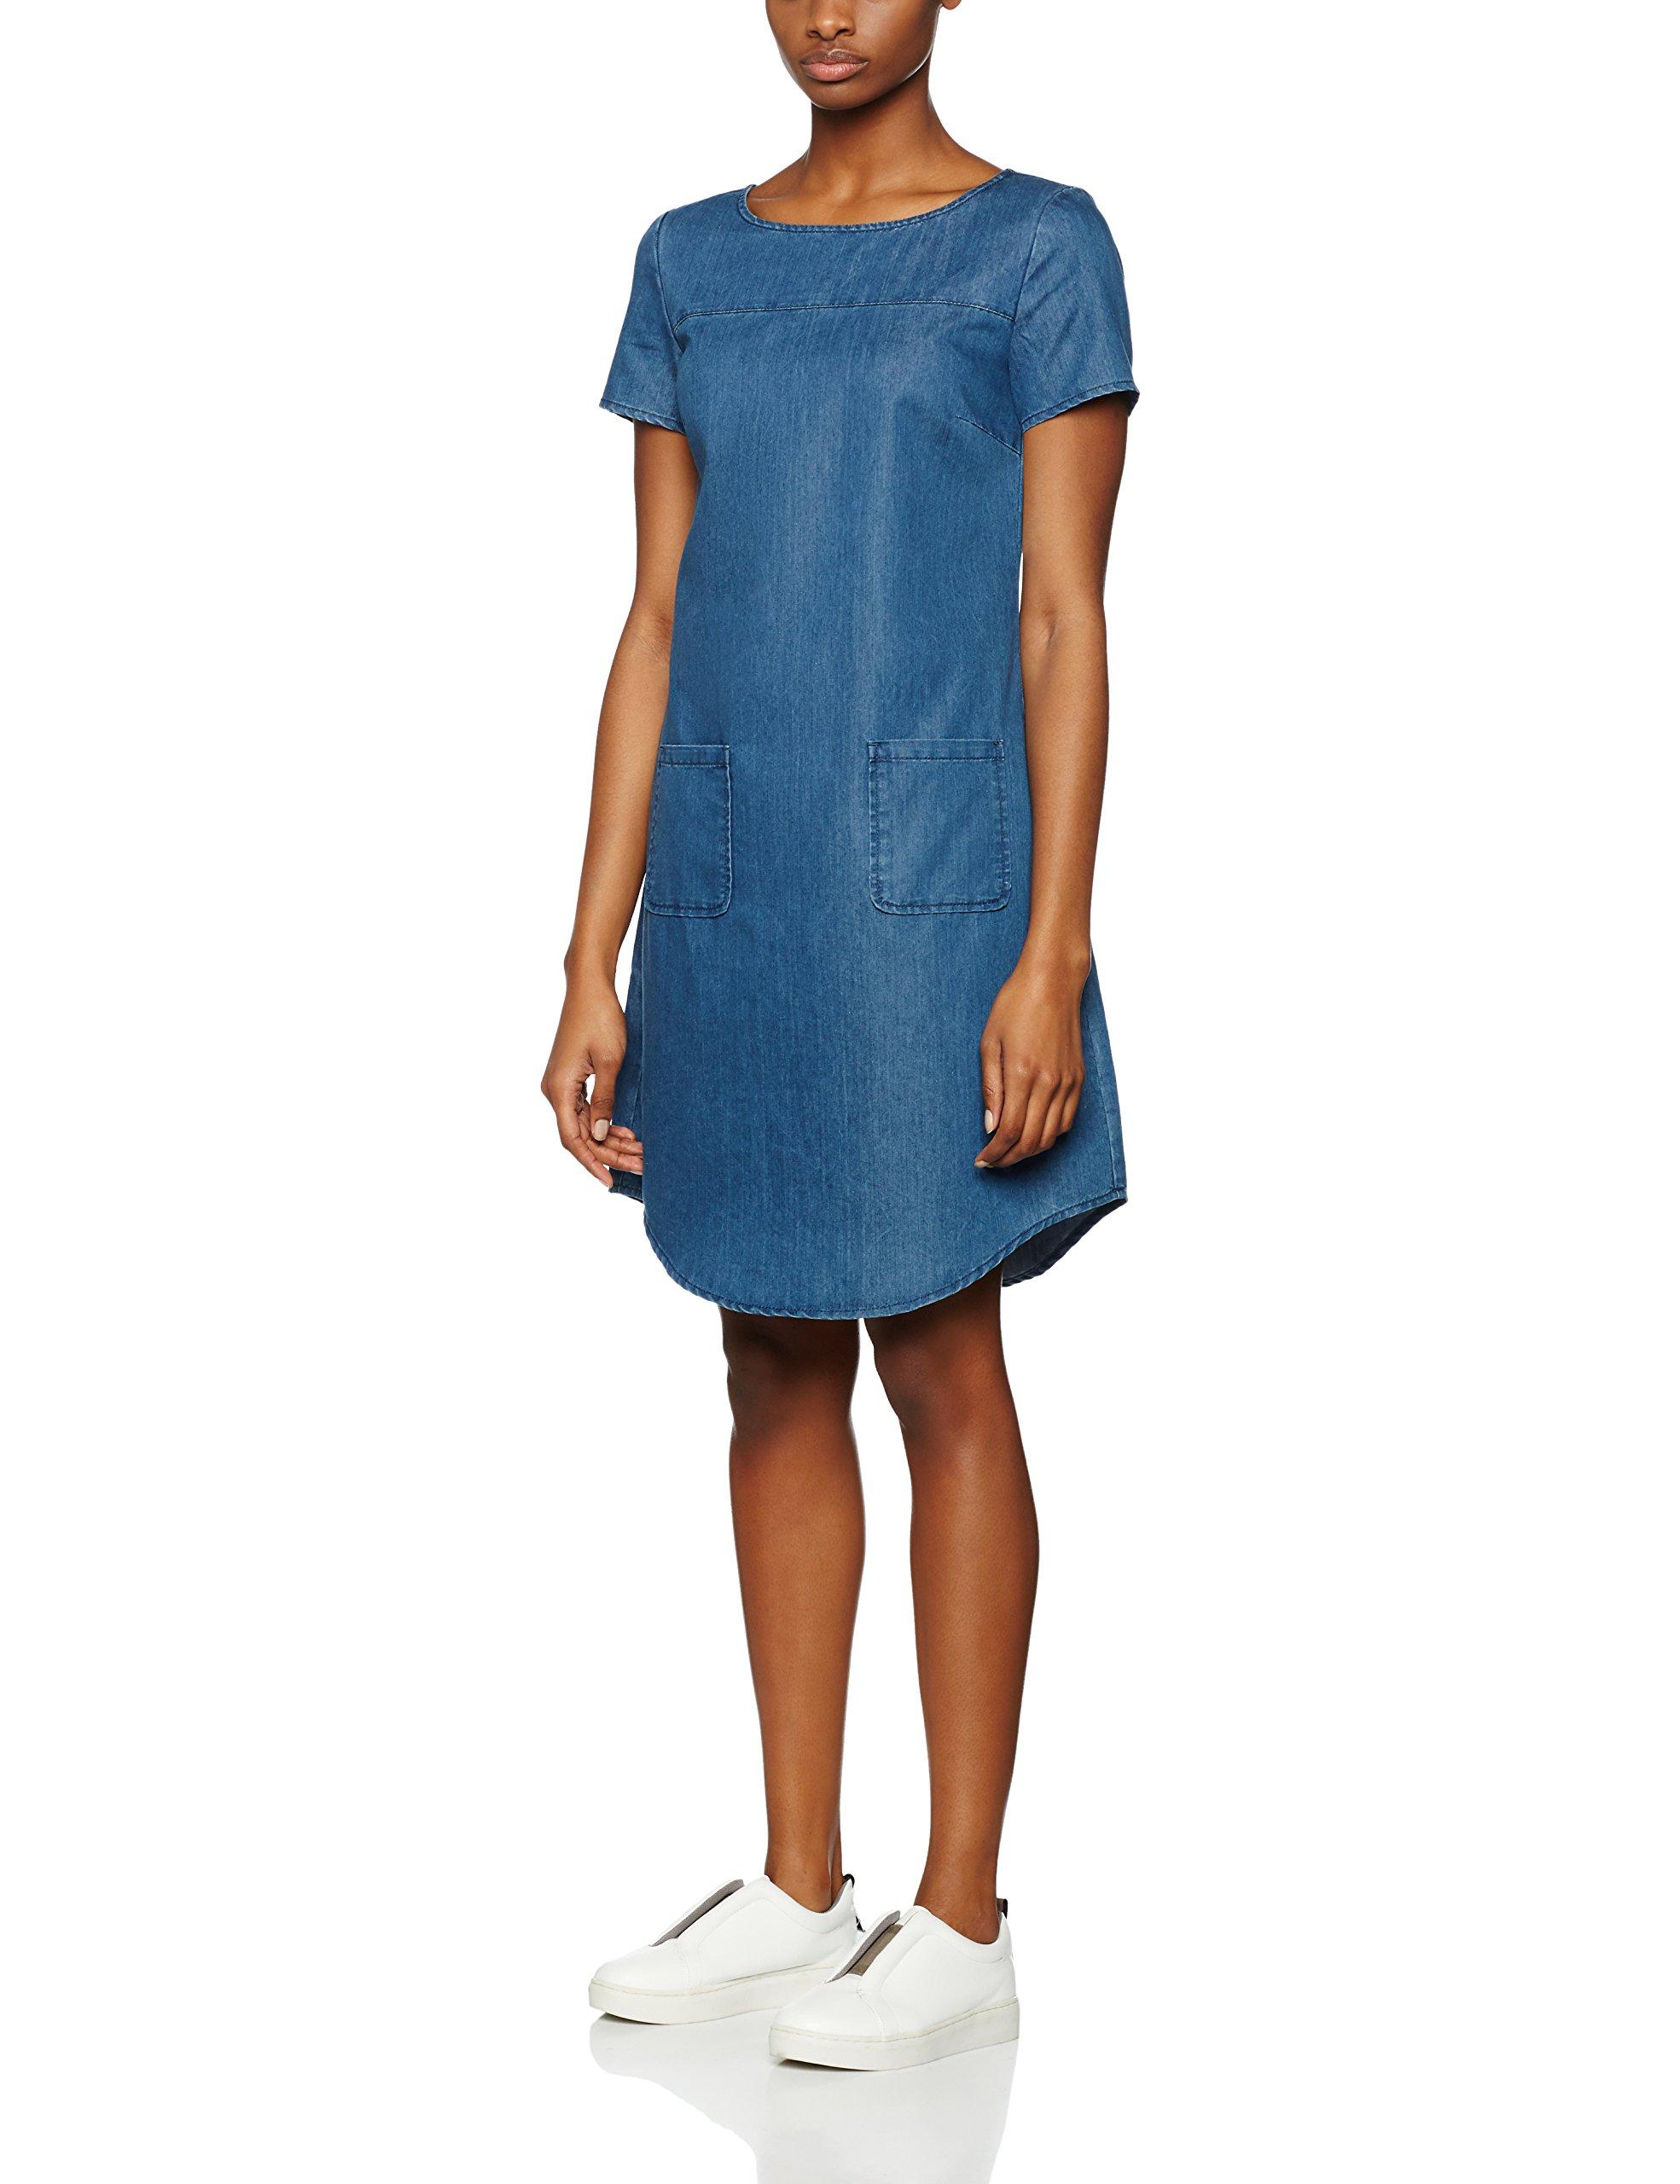 RobeBleumid Denim 096236 Kleid Femme Blue Moreamp; 0wPZN8OknX